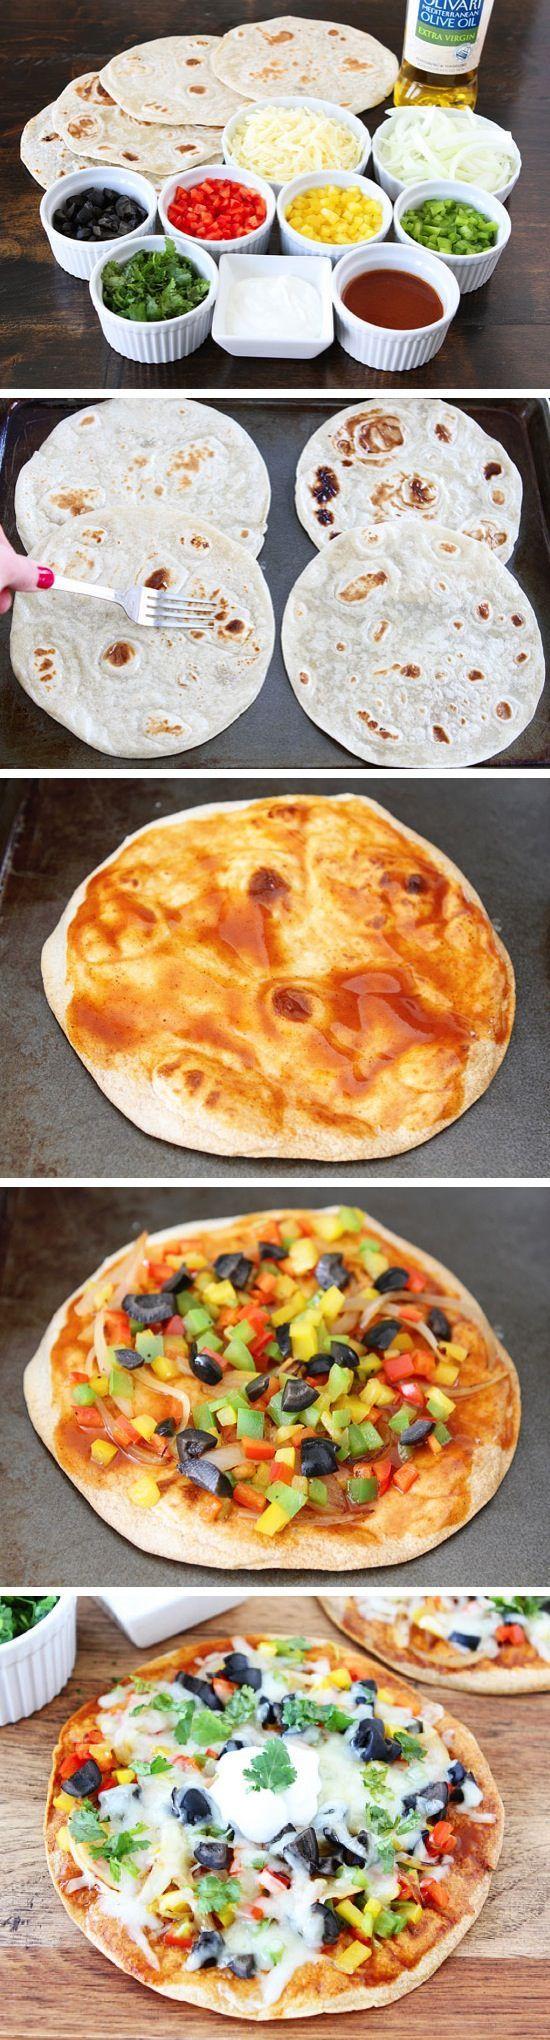 open faced enchilada veggie quesadillas recipe clean foods sour cream and healthy pizza. Black Bedroom Furniture Sets. Home Design Ideas